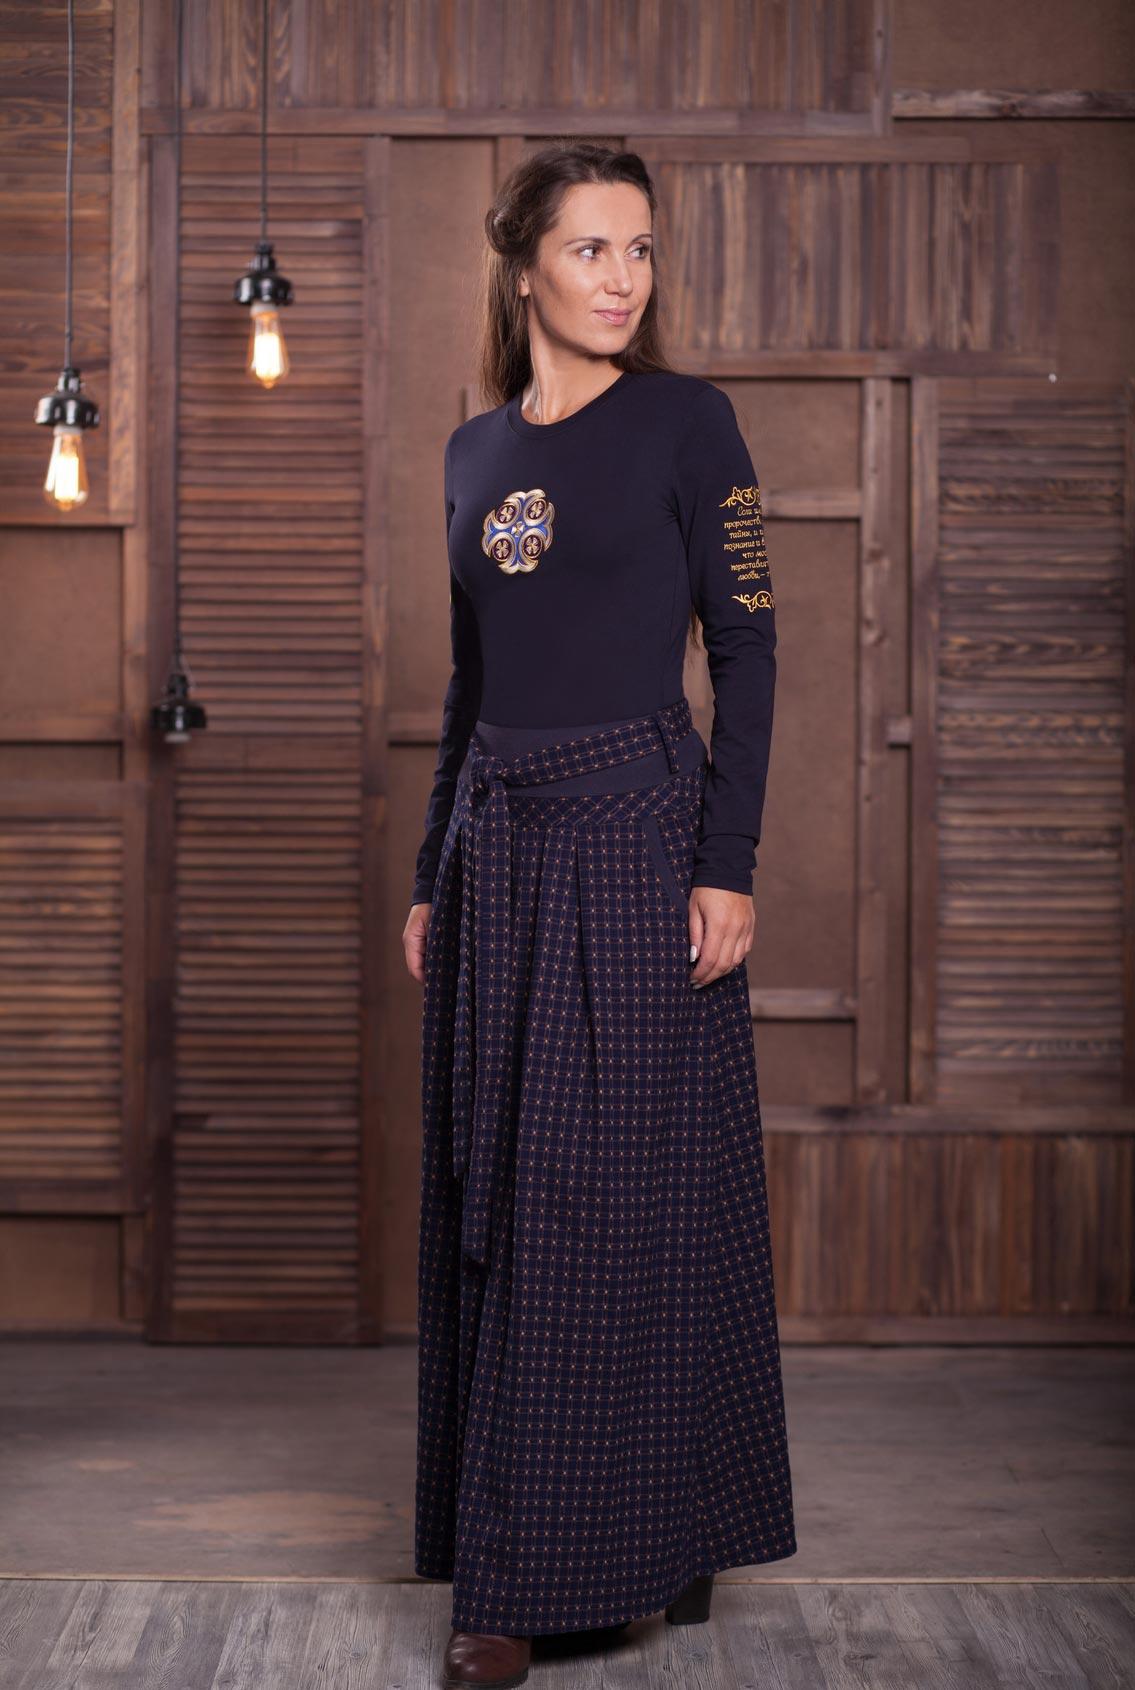 женская одежда с крестом, women's clothing with cross